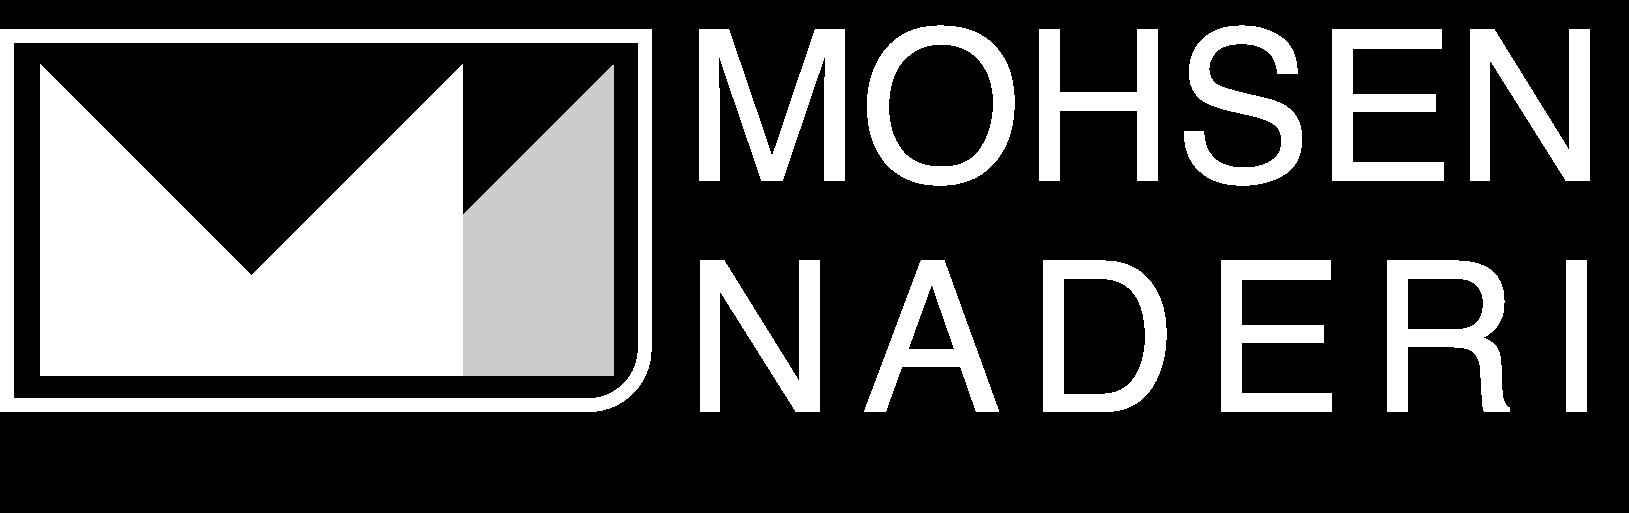 Mohsen Naderi